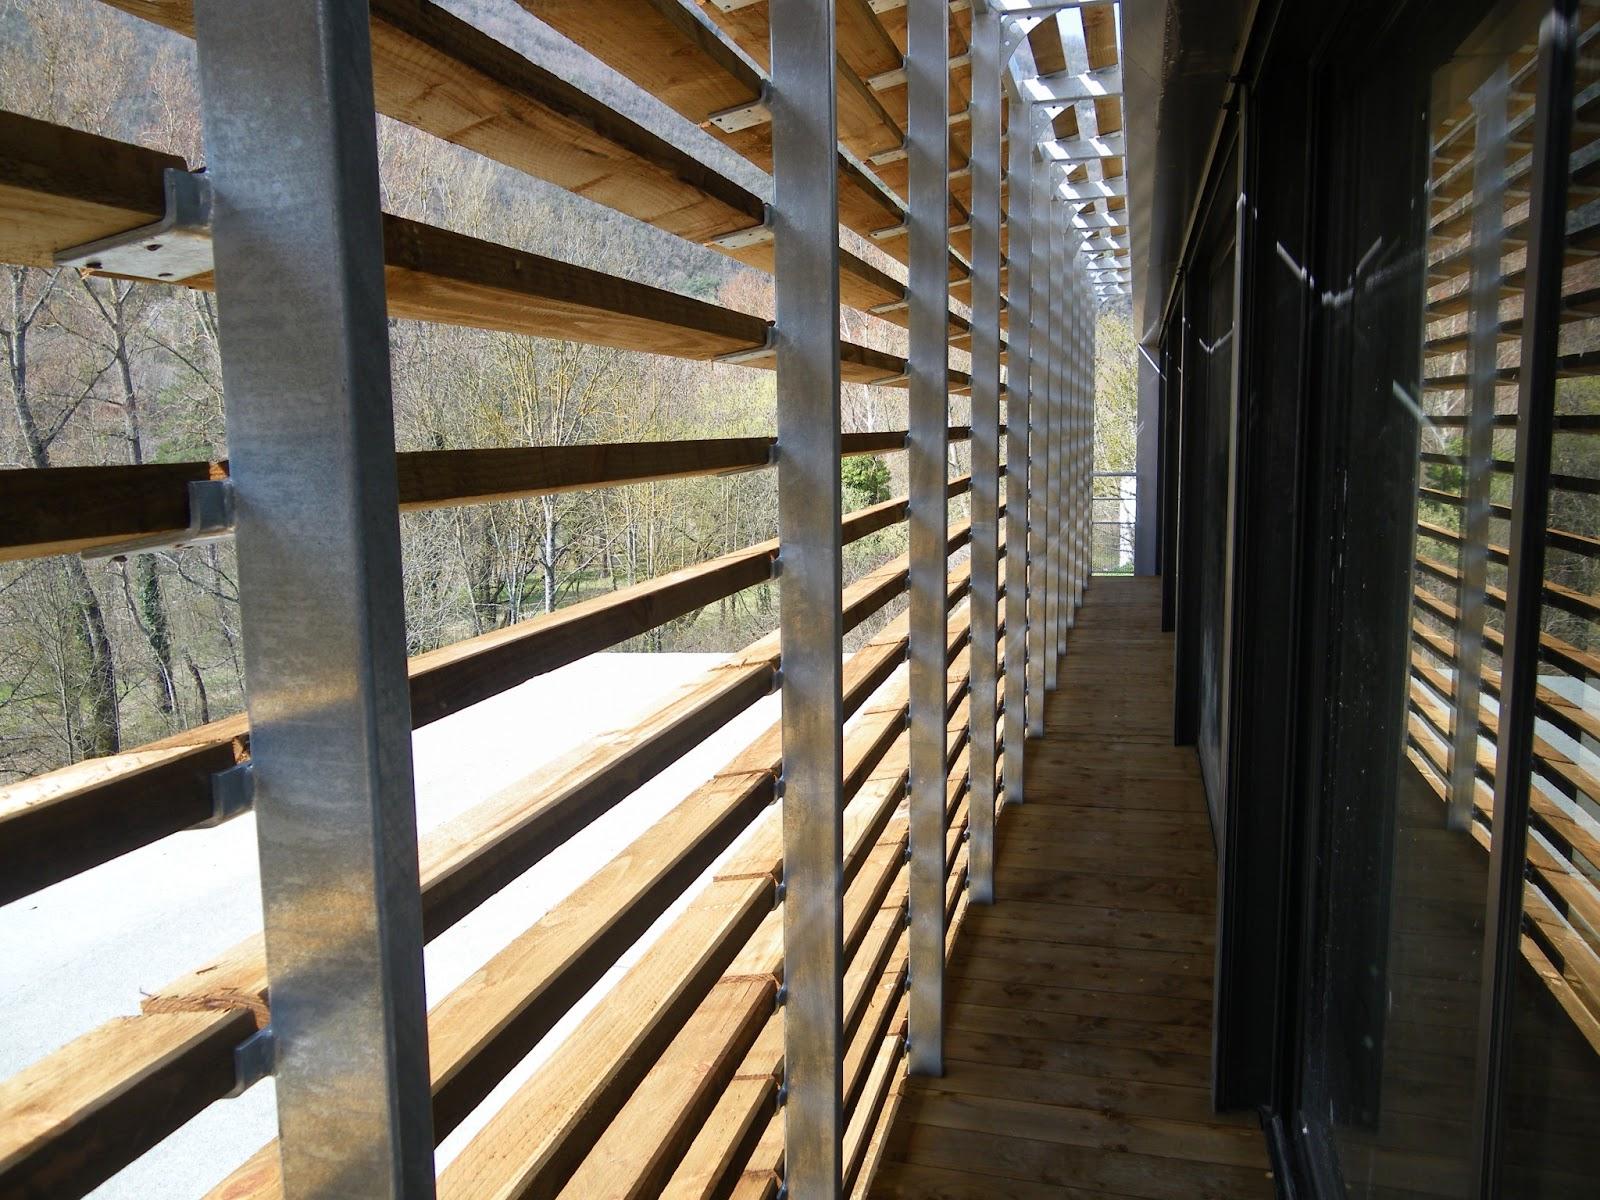 Brise Soleil Orientable Bois - Gite Emeraude Design& Nature u00ae Gorges du Tarn Gite Emeraude brise soleil en vue